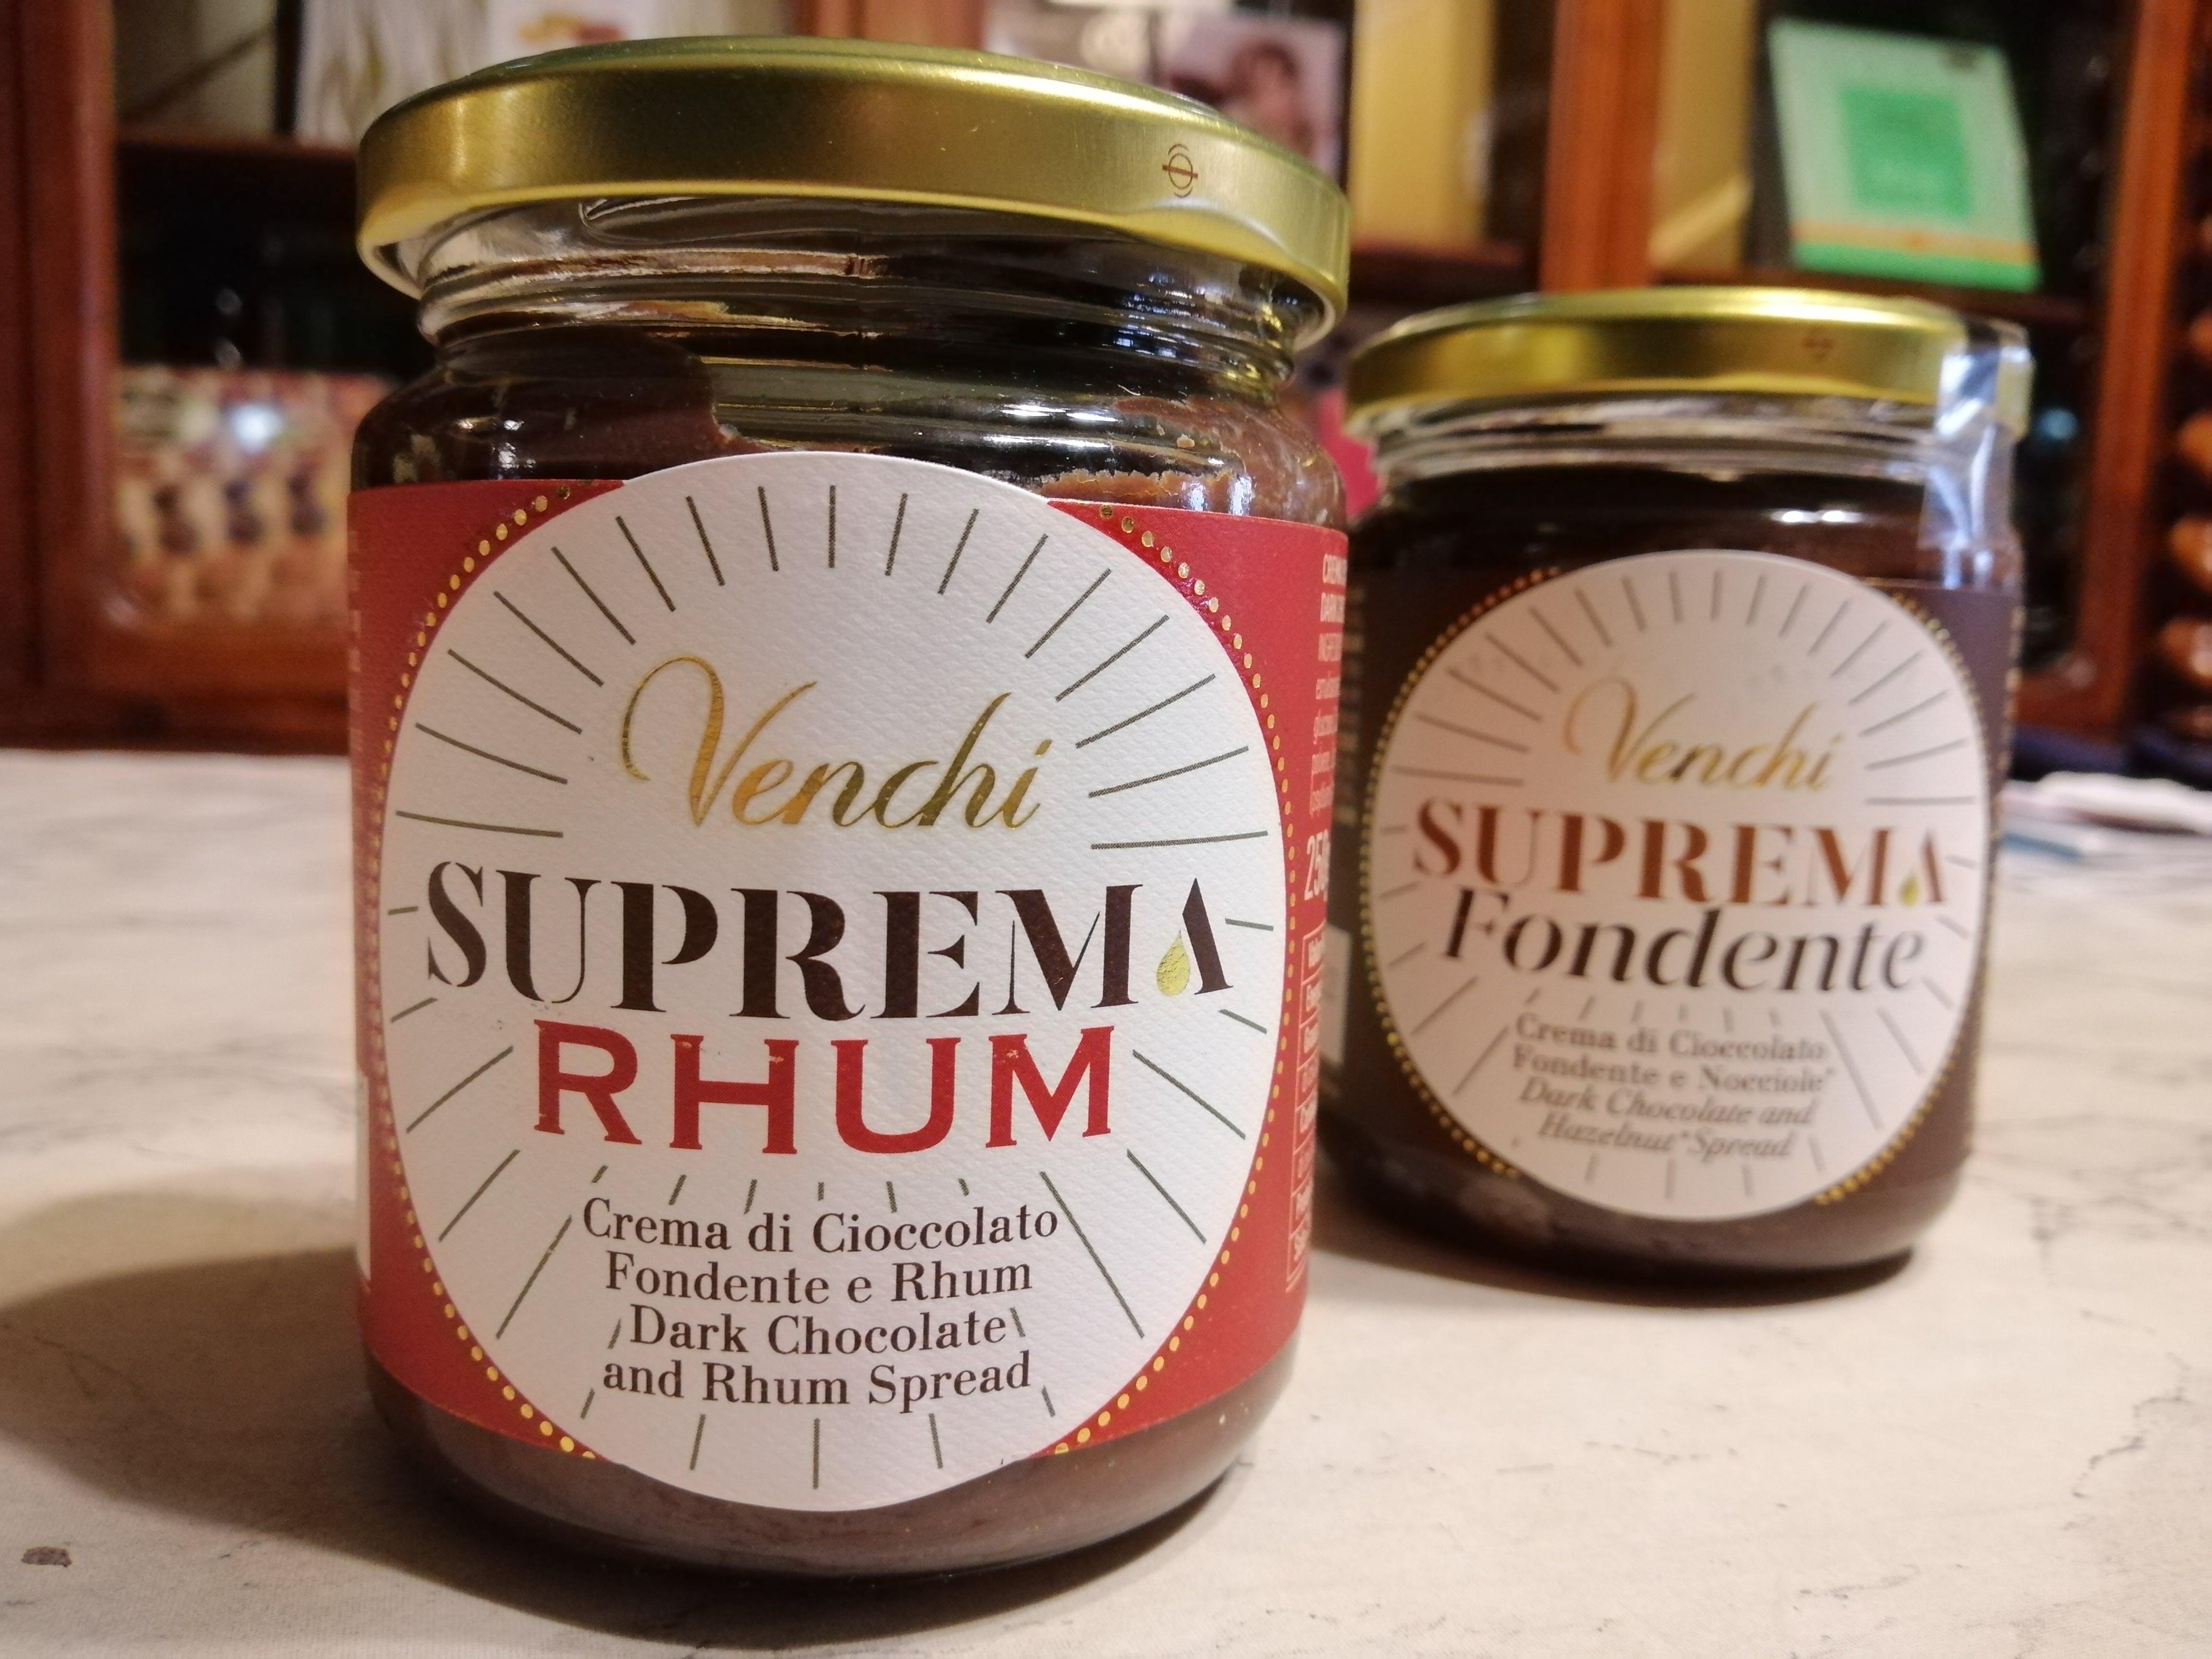 Venchi, Suprema Rhum